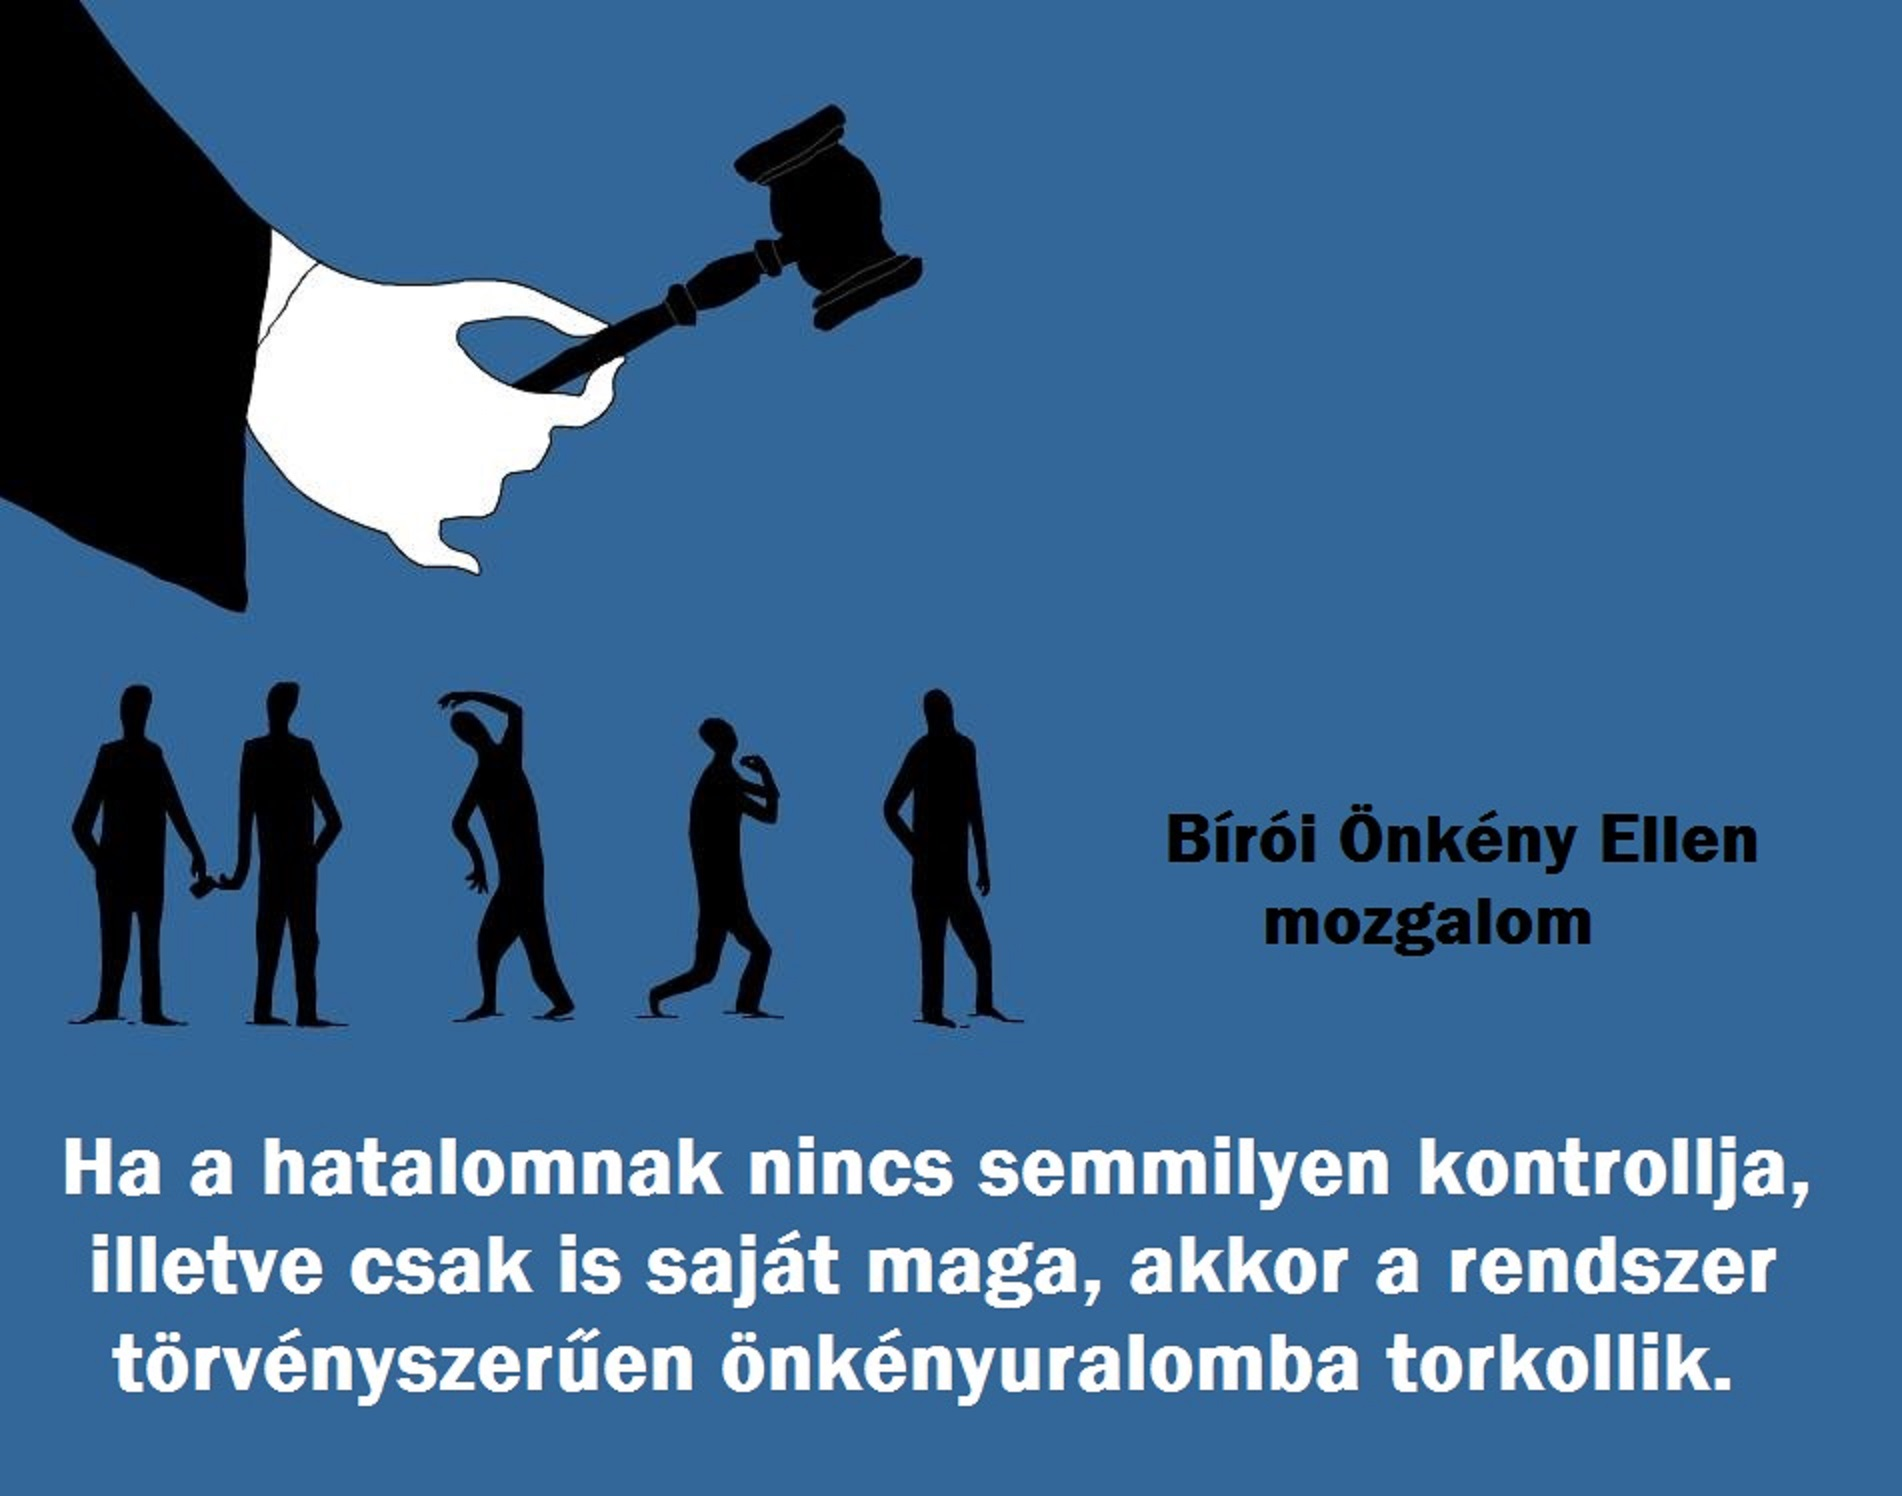 biroi_visszaeles_kep2.jpg